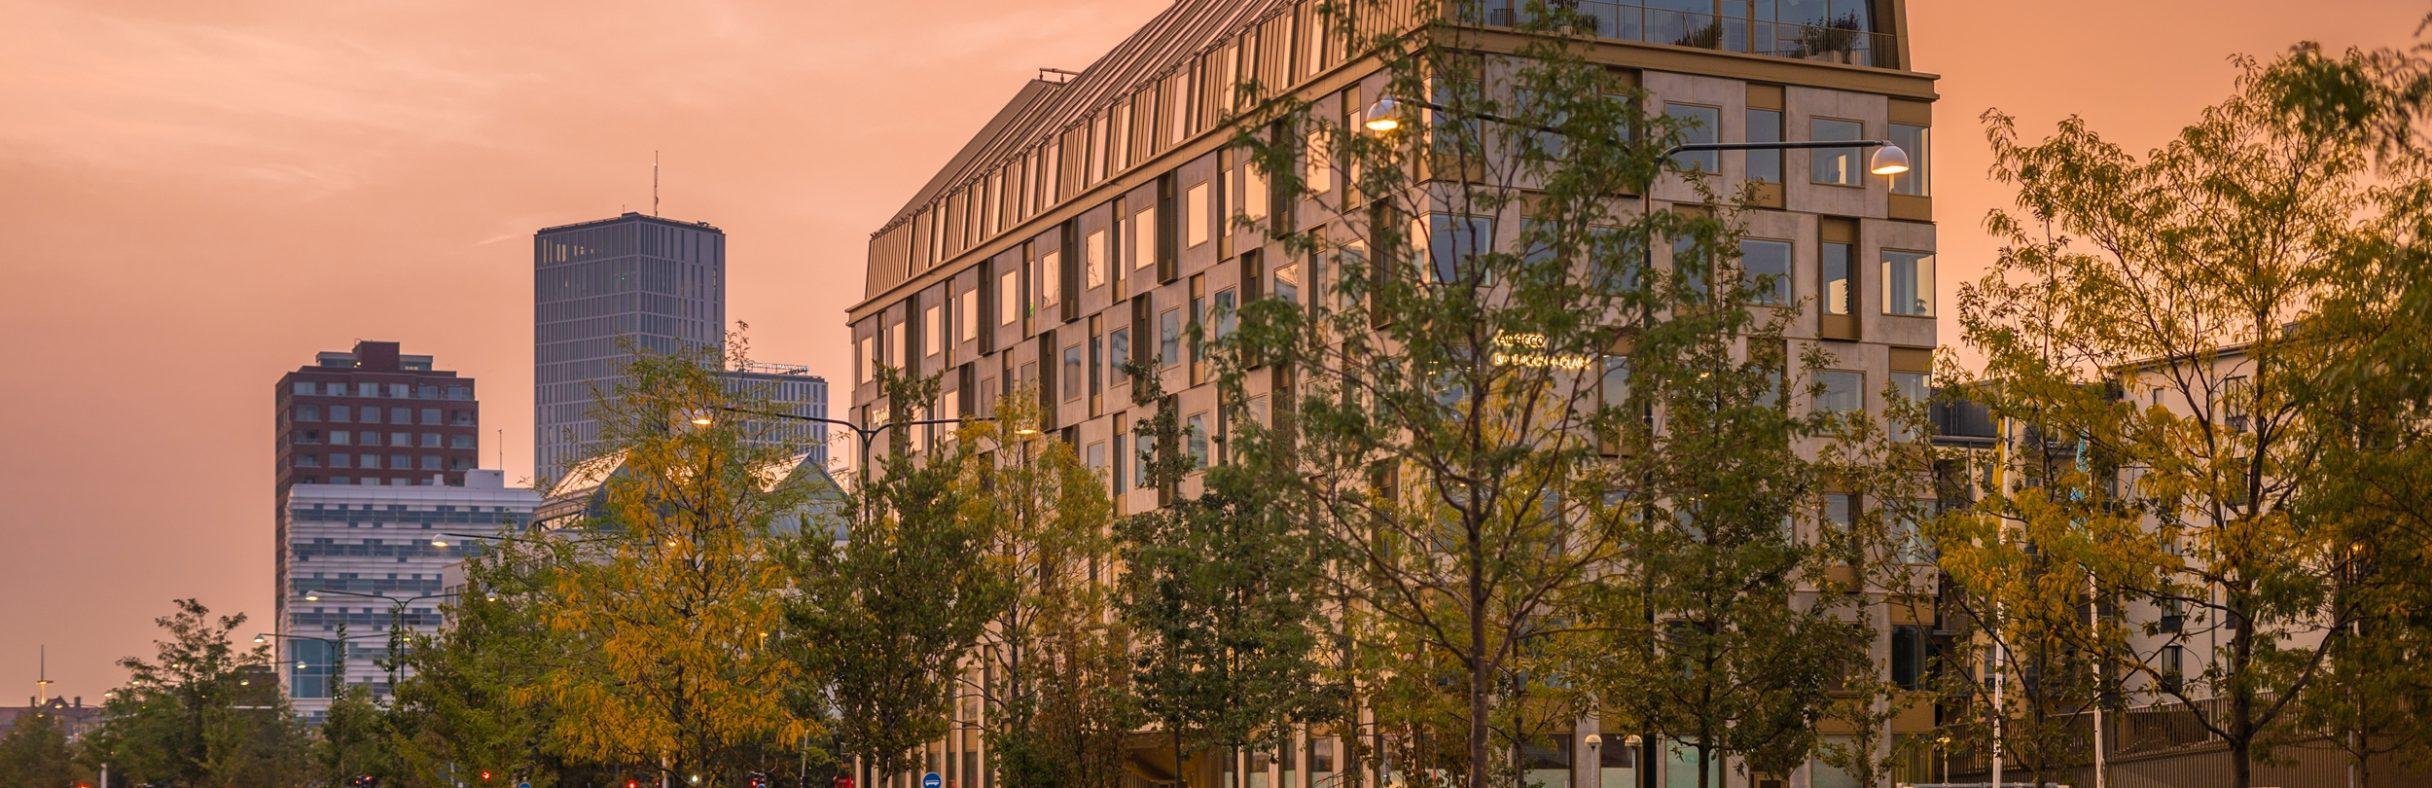 Kontorshuset Aura i kvälssolen